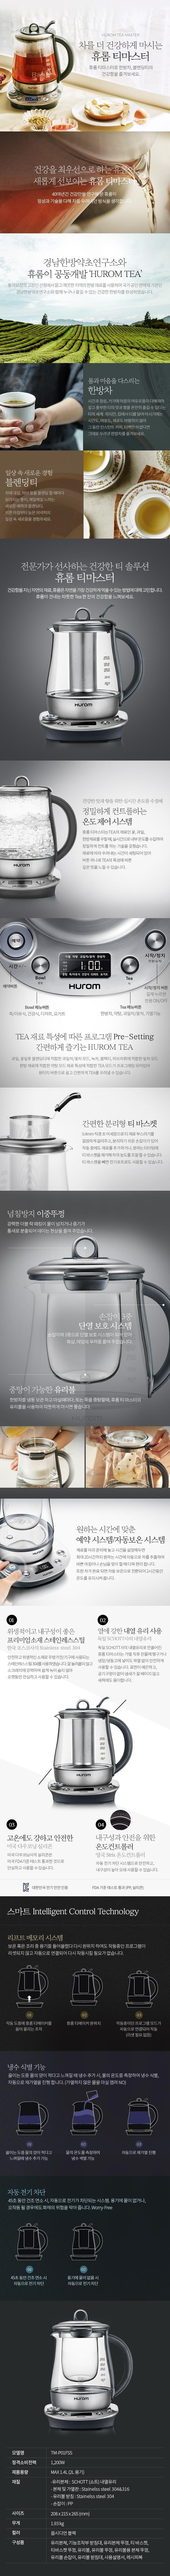 Hurom Tea Master TM-P01FSS.jpg